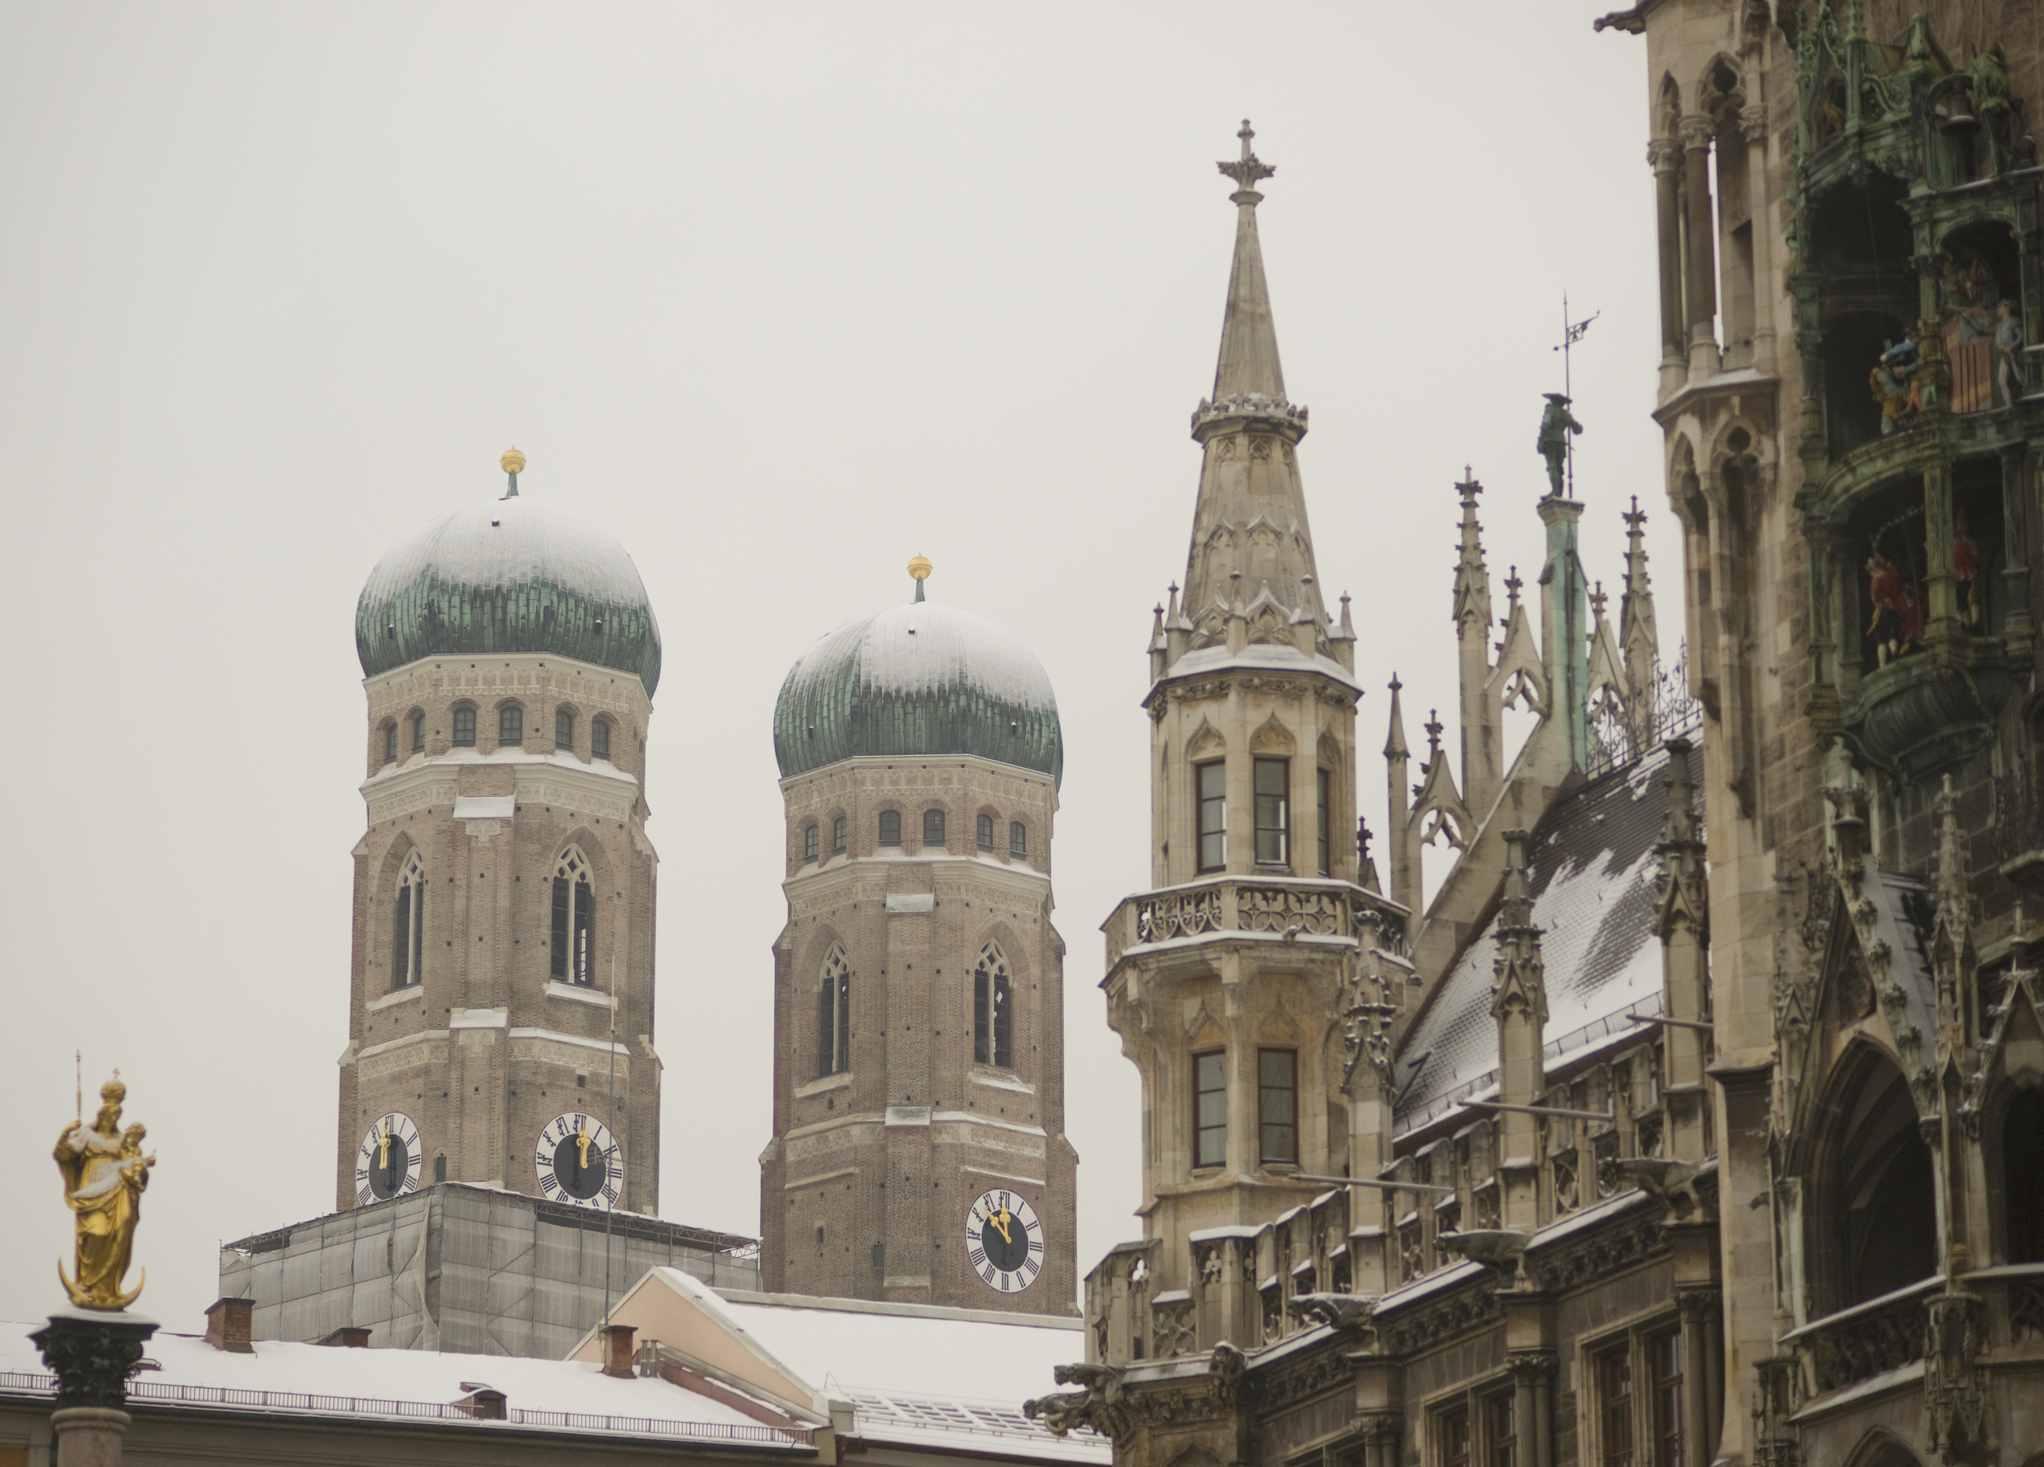 Munich's Church Of Our Lady (Dom Zu Unserer Lieben Frau)